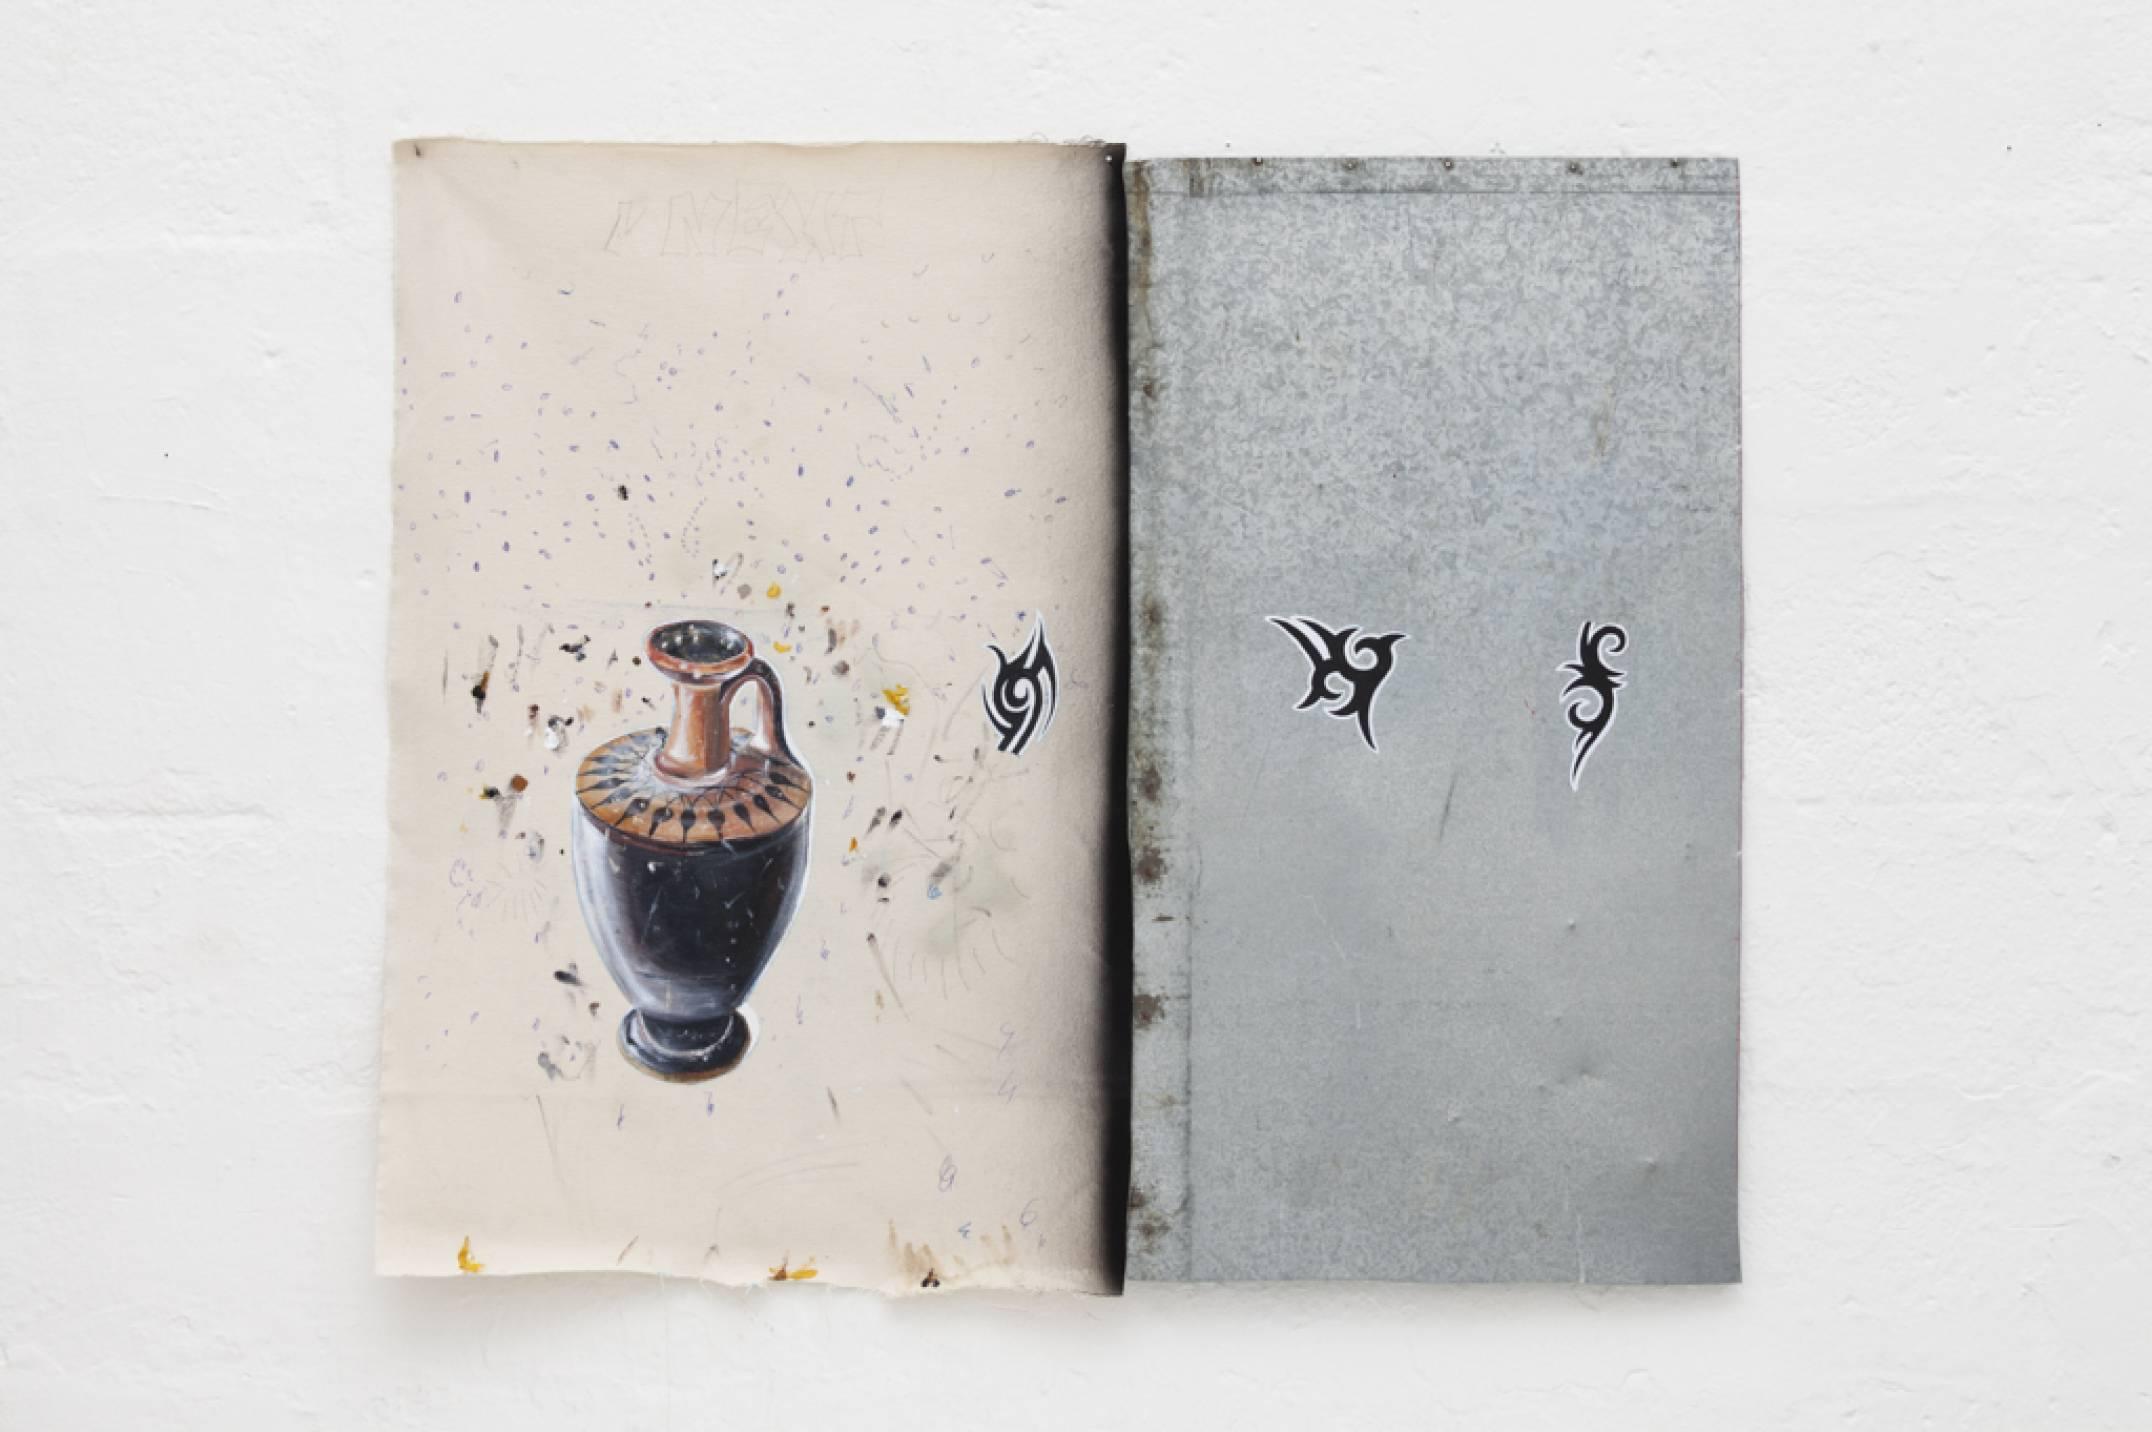 Paulo Nimer Pjota, <em>Tribal Pottery</em>, 2017, acrylic and pen on aluminum, 97 × 80 cm - Mendes Wood DM